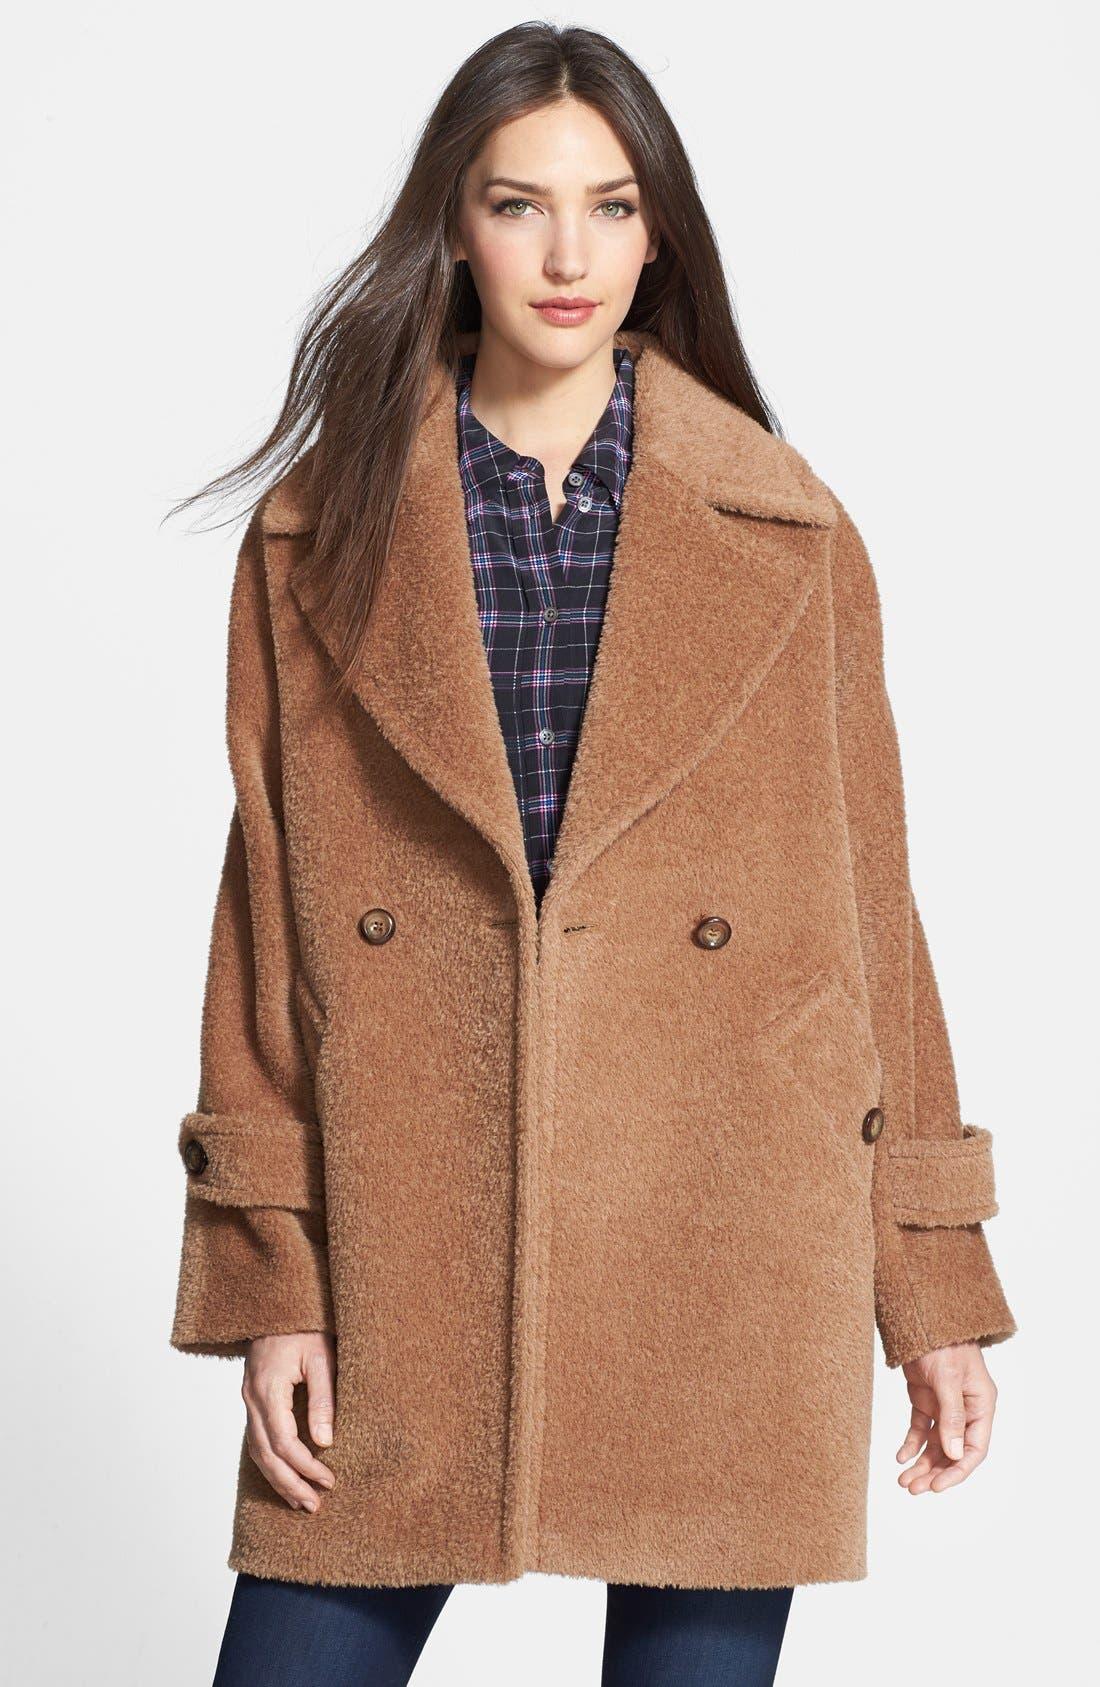 Main Image - Trina Turk 'Nancy' Double Breasted Wool & Alpaca Blend Coat